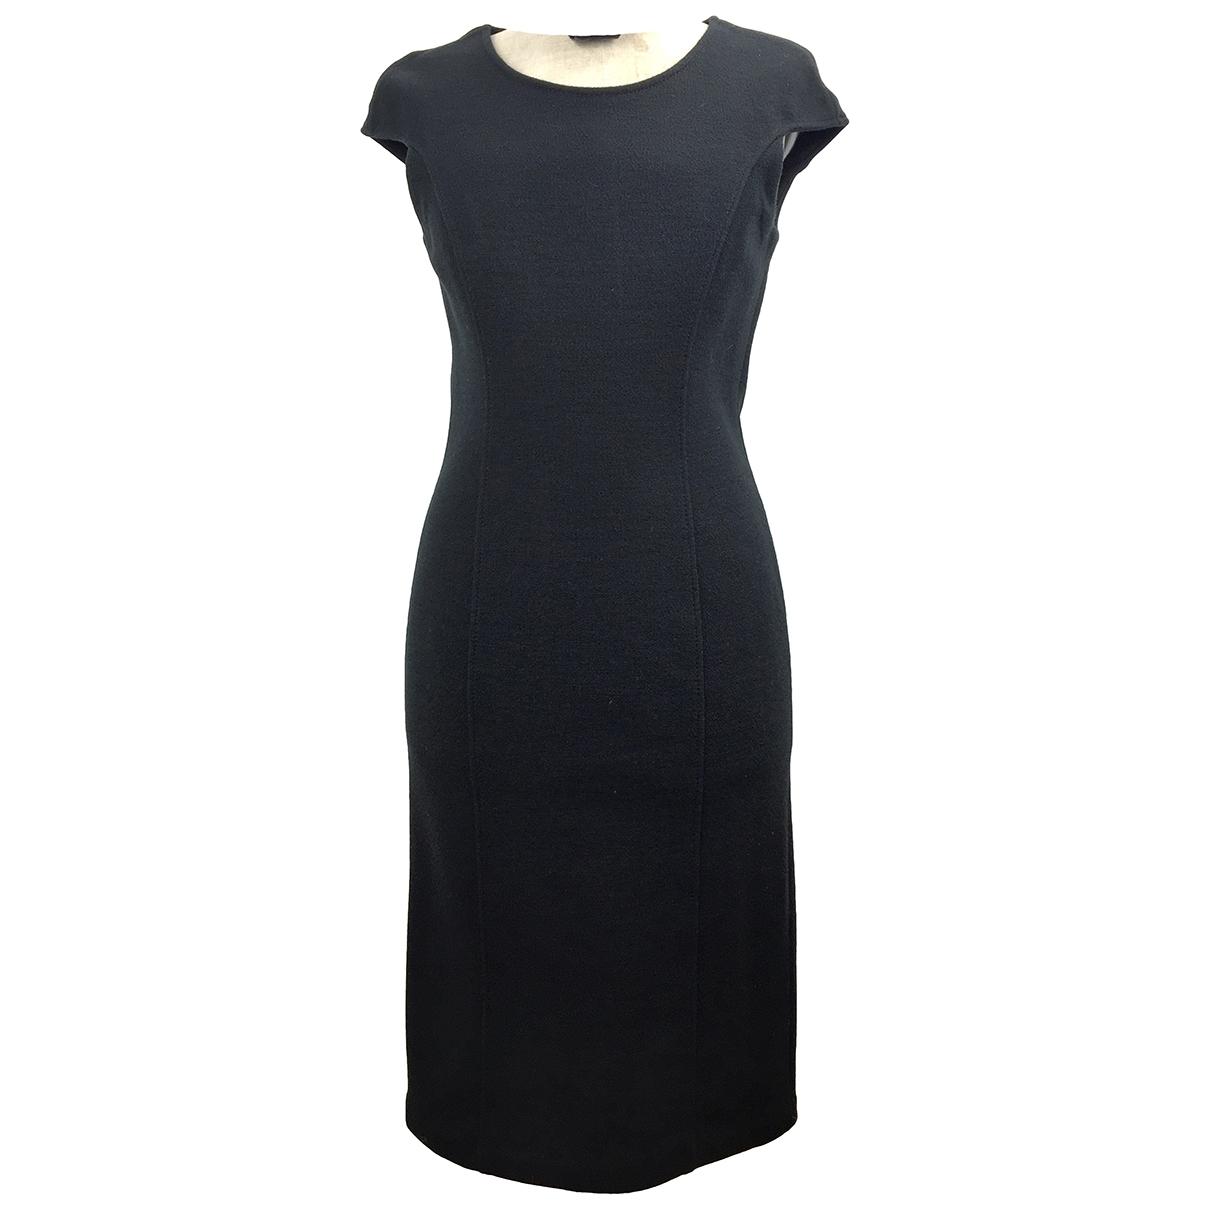 Armani Collezioni \N Kleid in  Schwarz Wolle